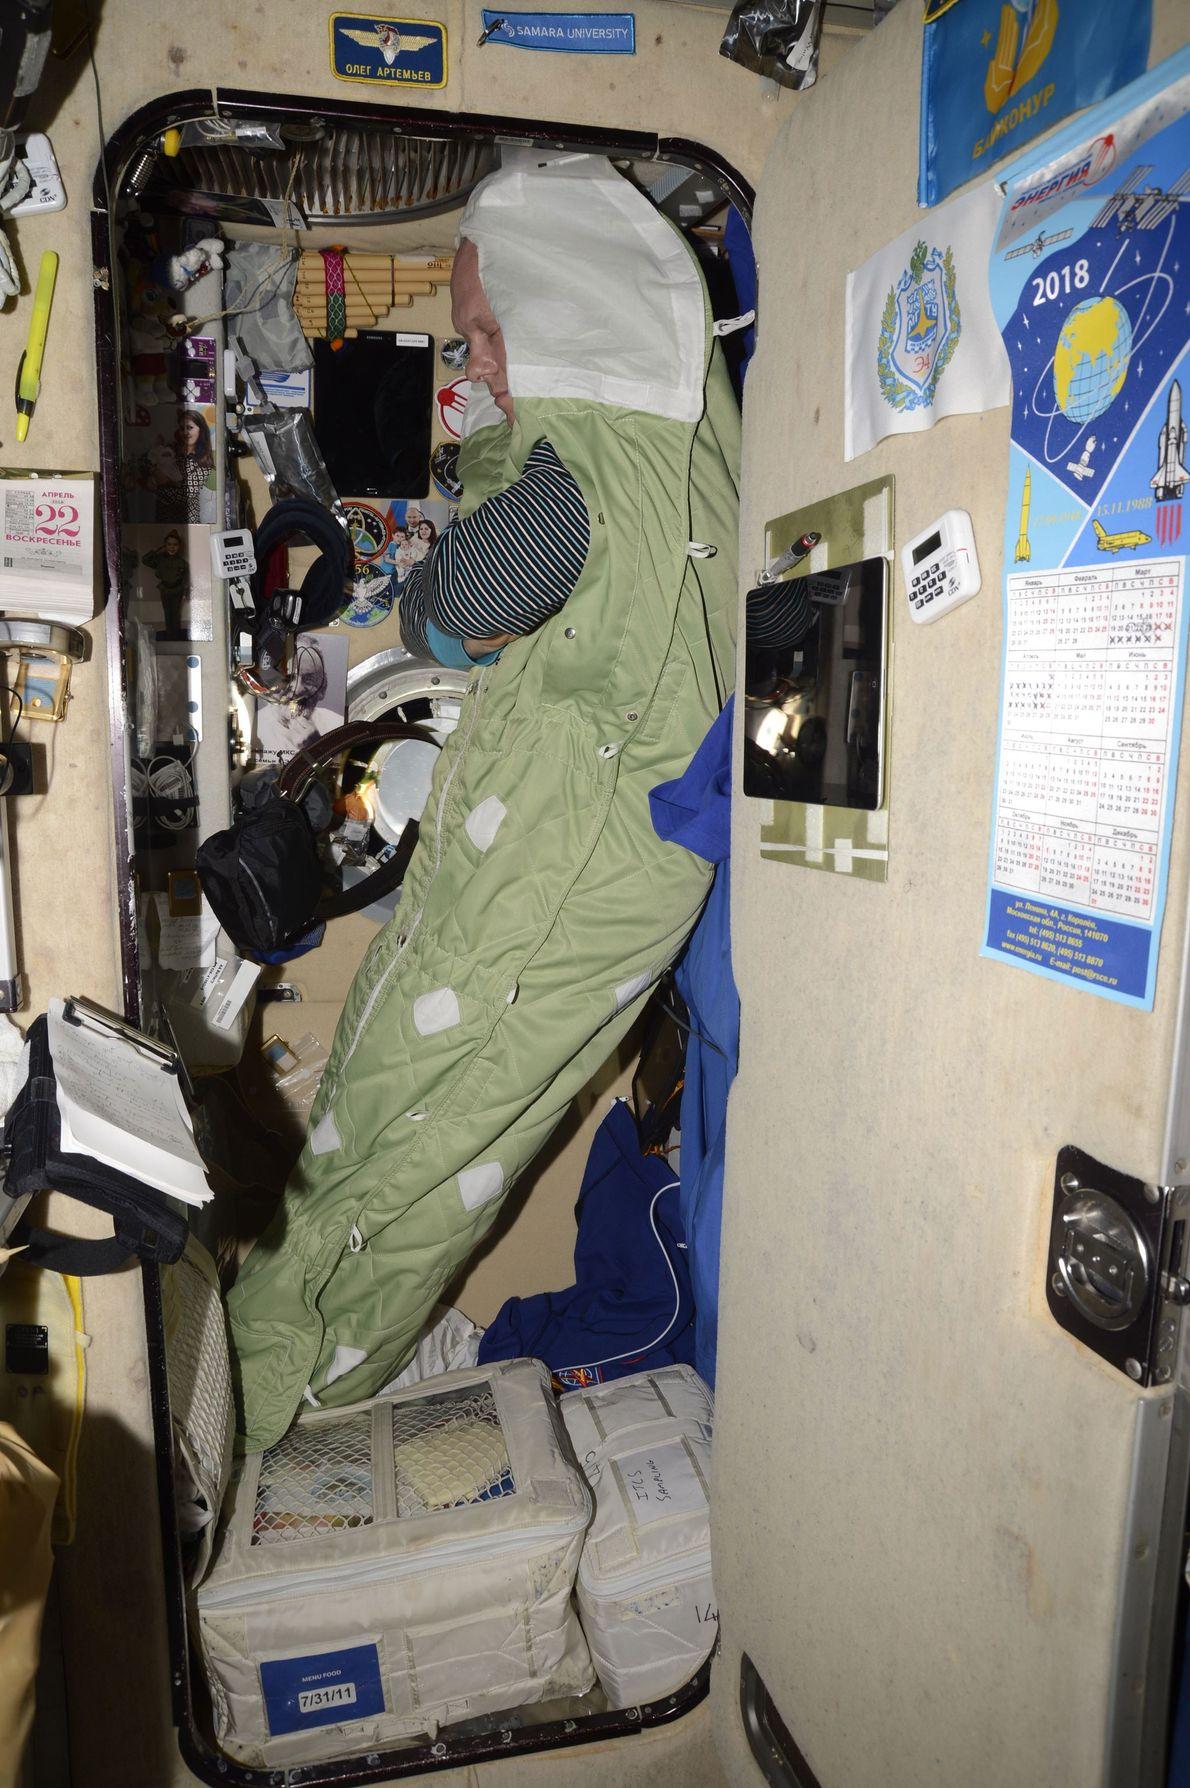 O cosmonauta Oleg Germanovich Artemyev dorme na gravidade zero.